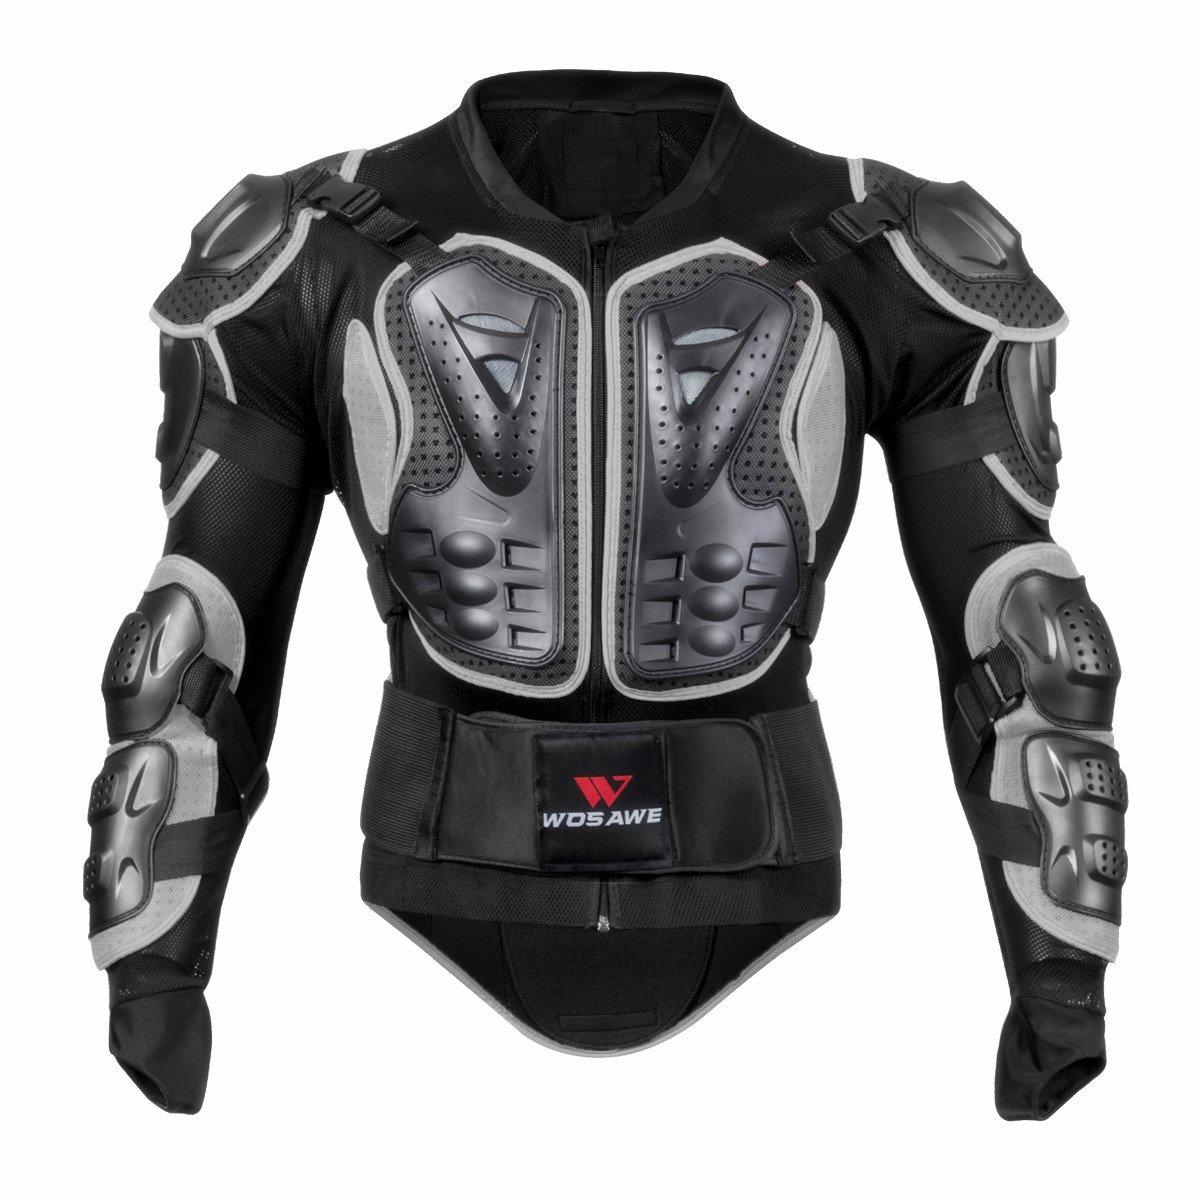 WOSAWE BMX Body Armor Mountain Bike Body Protection Long Sleeve Armored Motorcycle Jacket, Black XX-Large